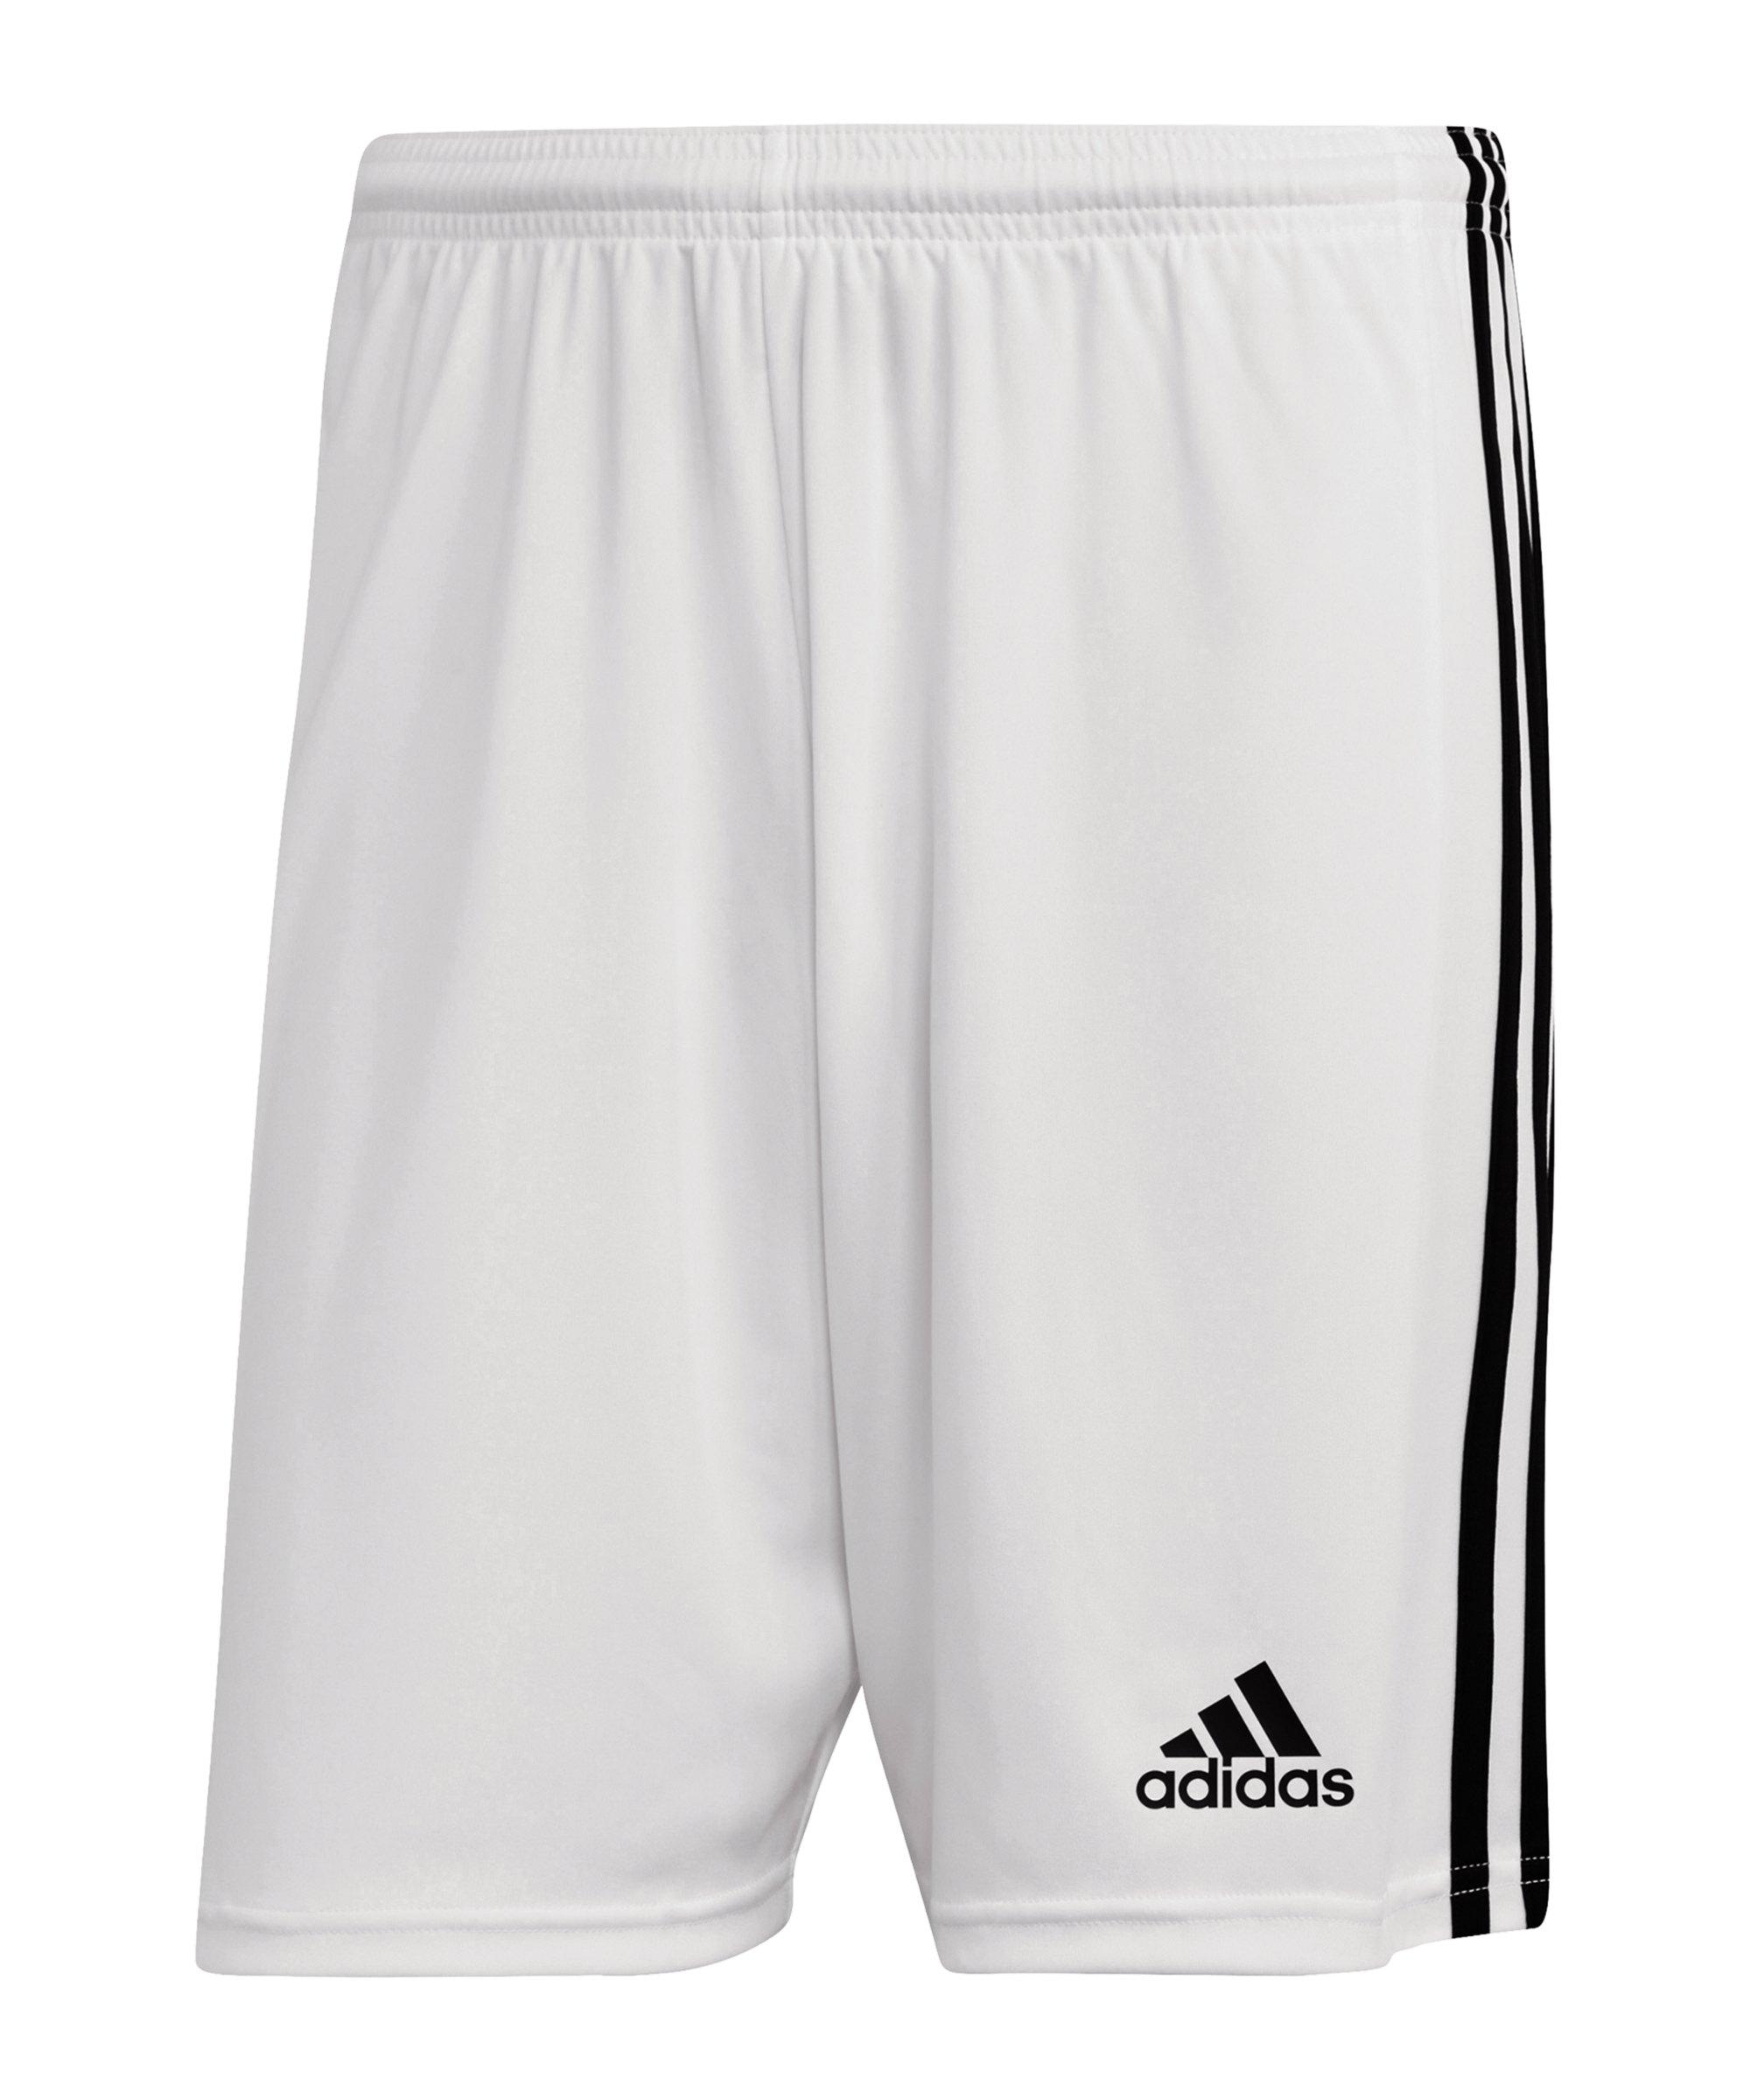 adidas Squadra 21 Short Weiss Schwarz - weiss